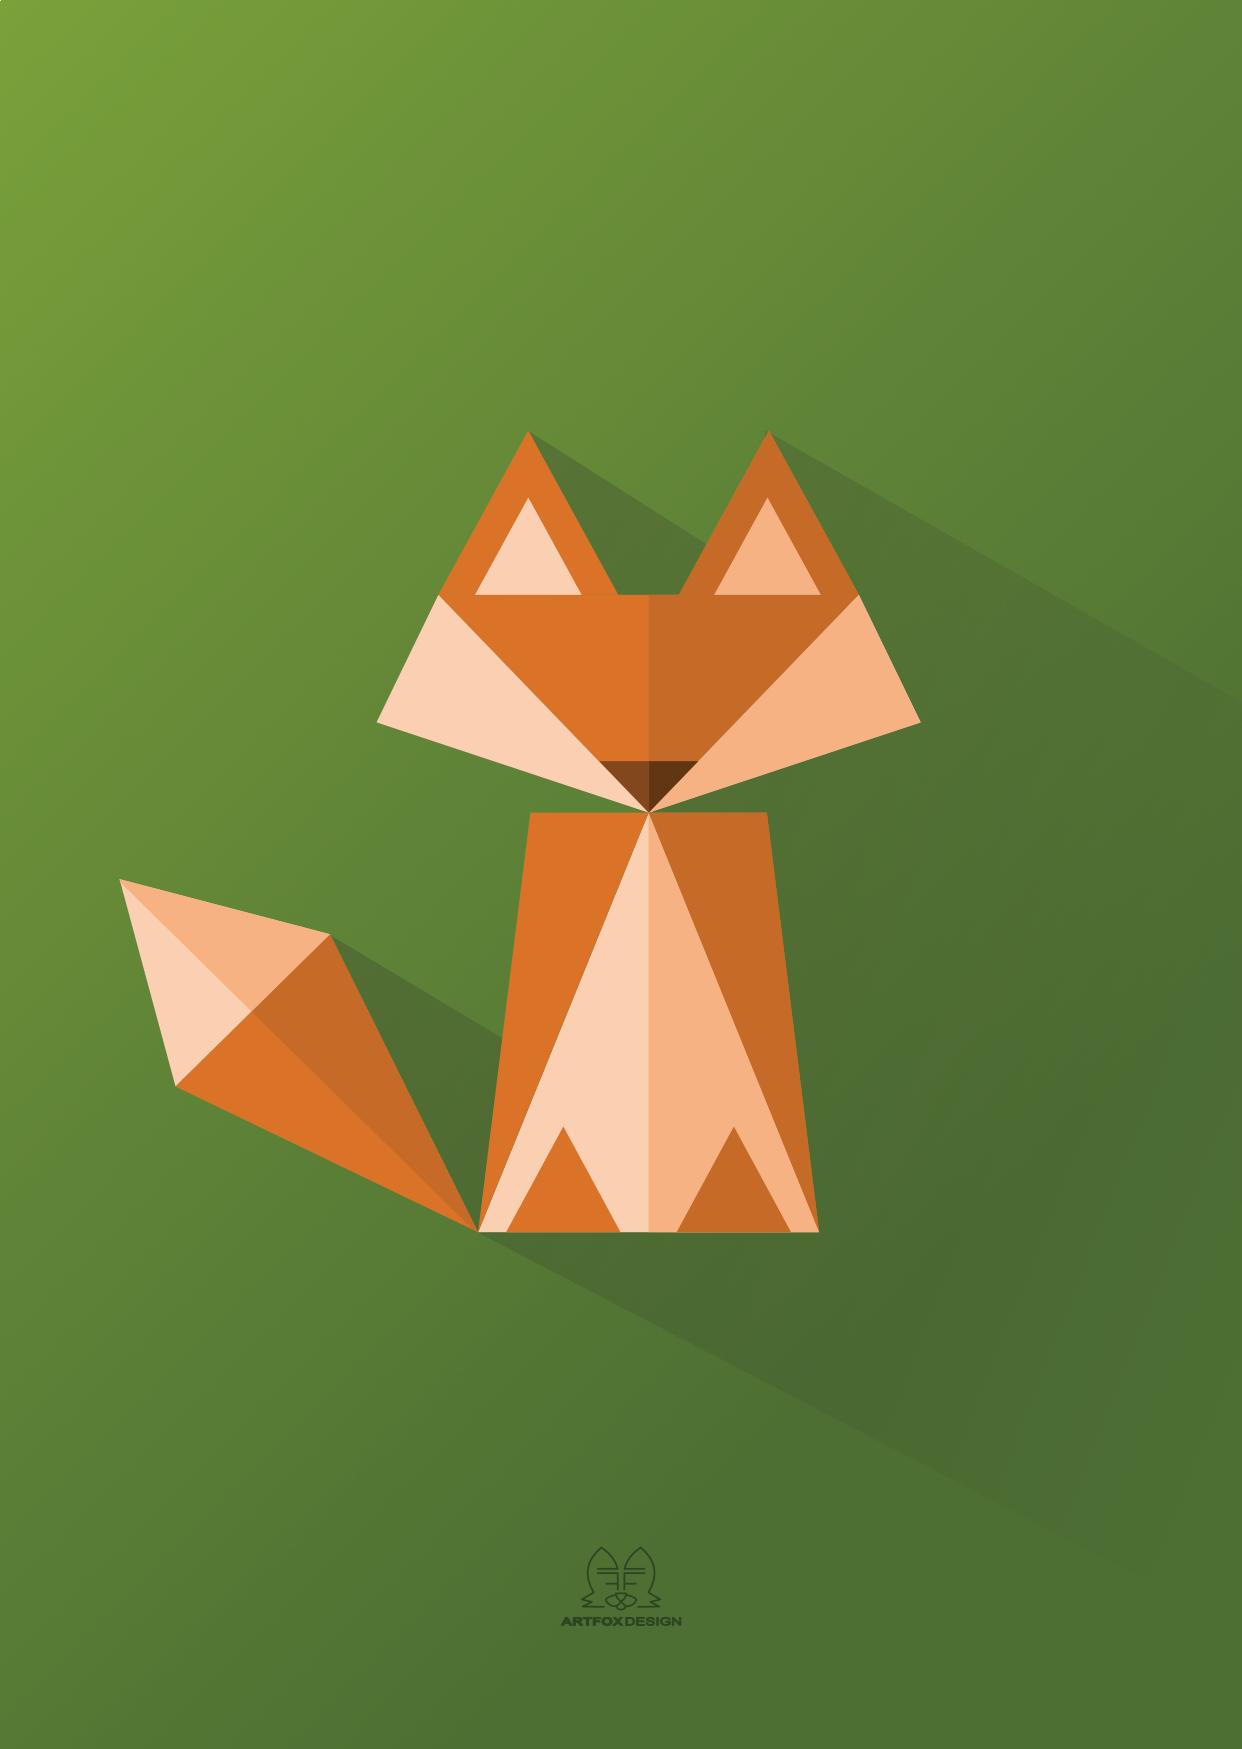 FoxSox